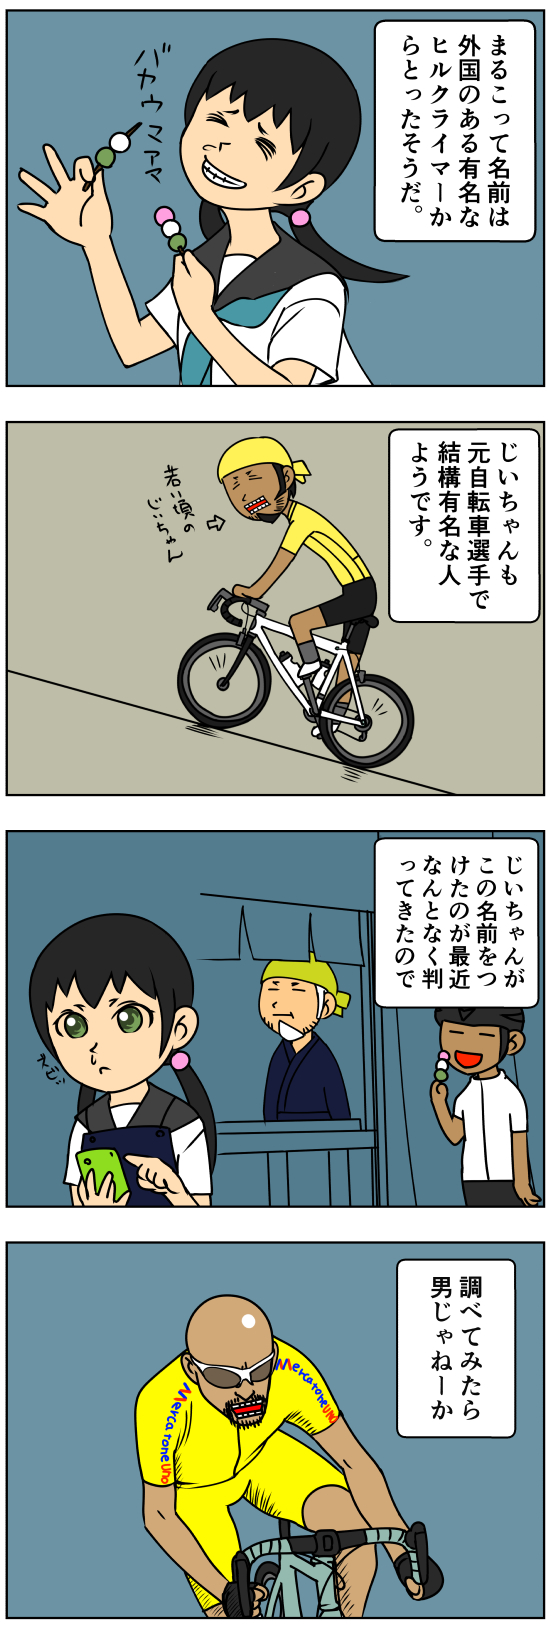 sansyokudanngochan-01-2.jpg